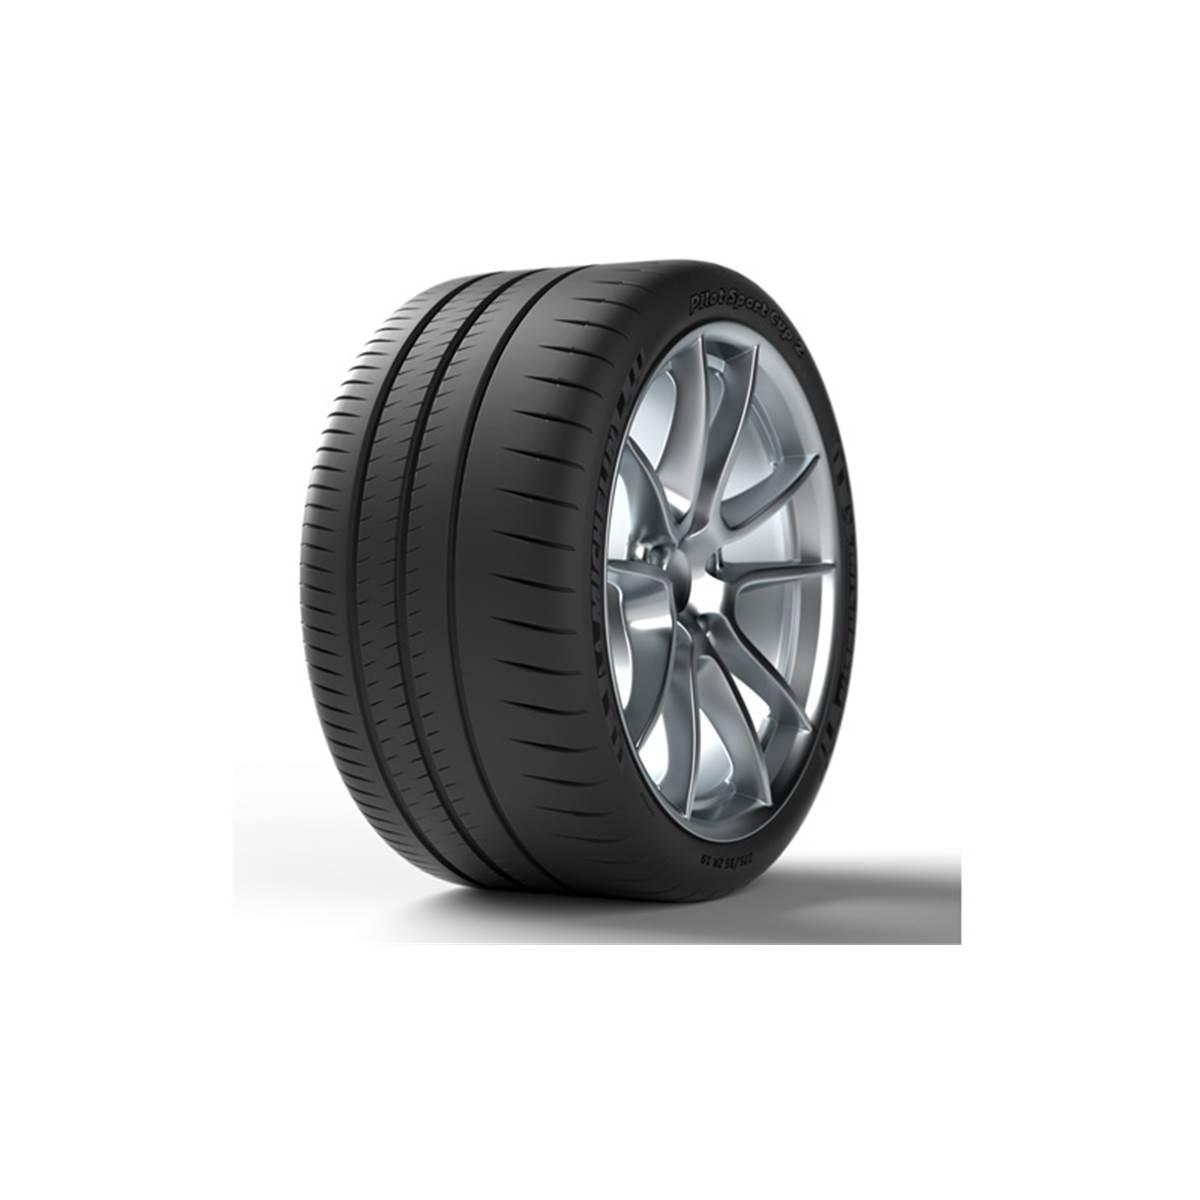 Pneu Michelin 265/35R20 95Y Pilot Sport Cup 2